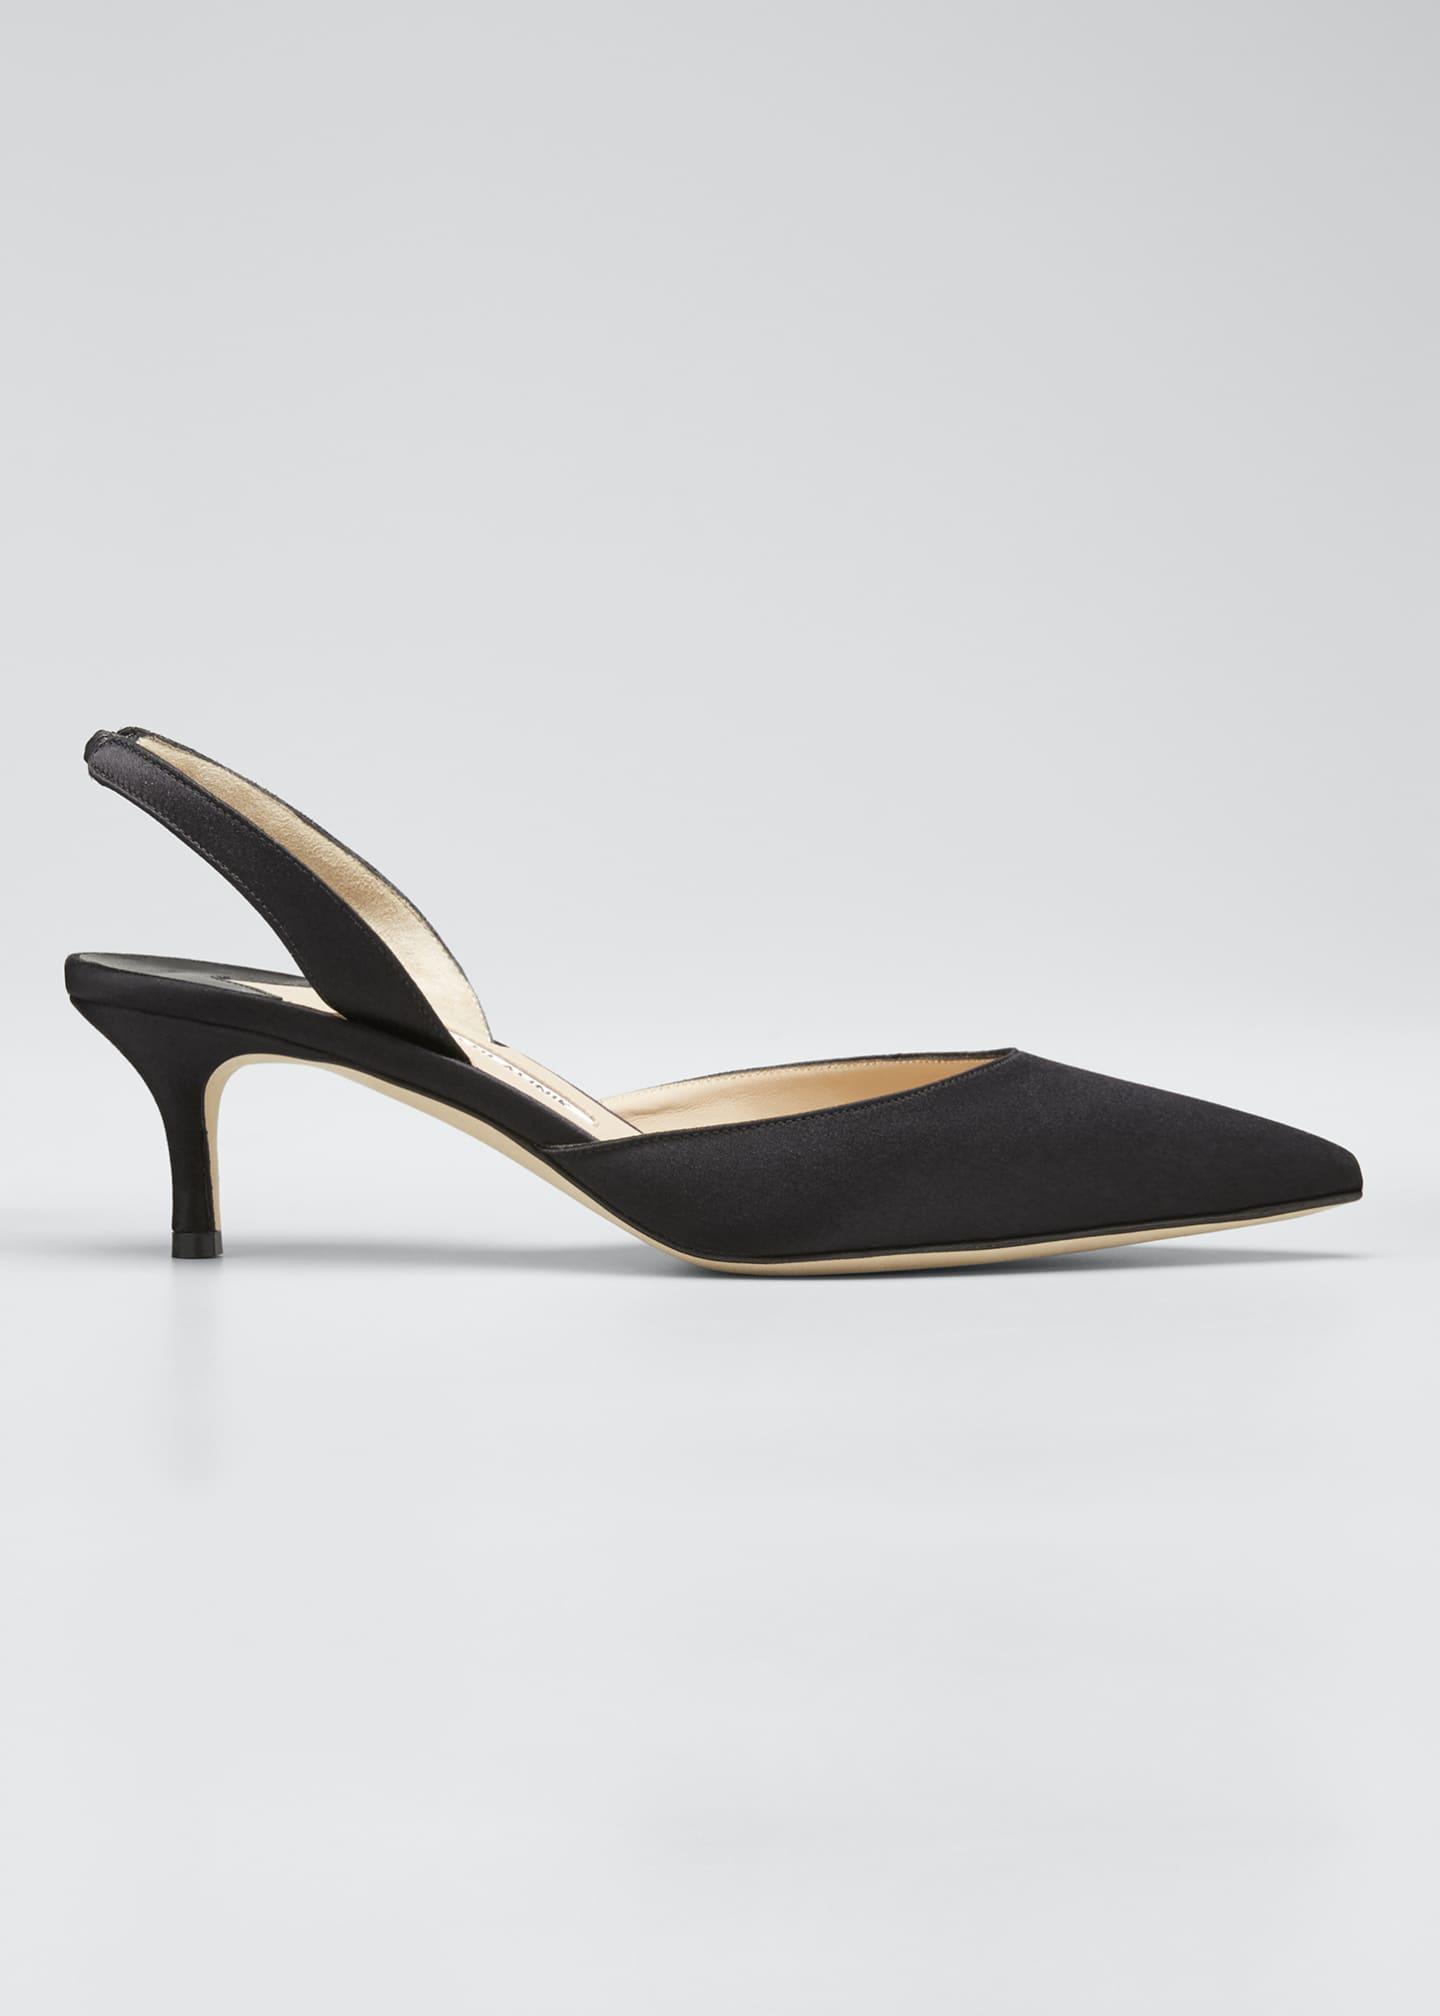 Manolo Blahnik Carolyne Satin Low-Heel Slingback Pumps, Black